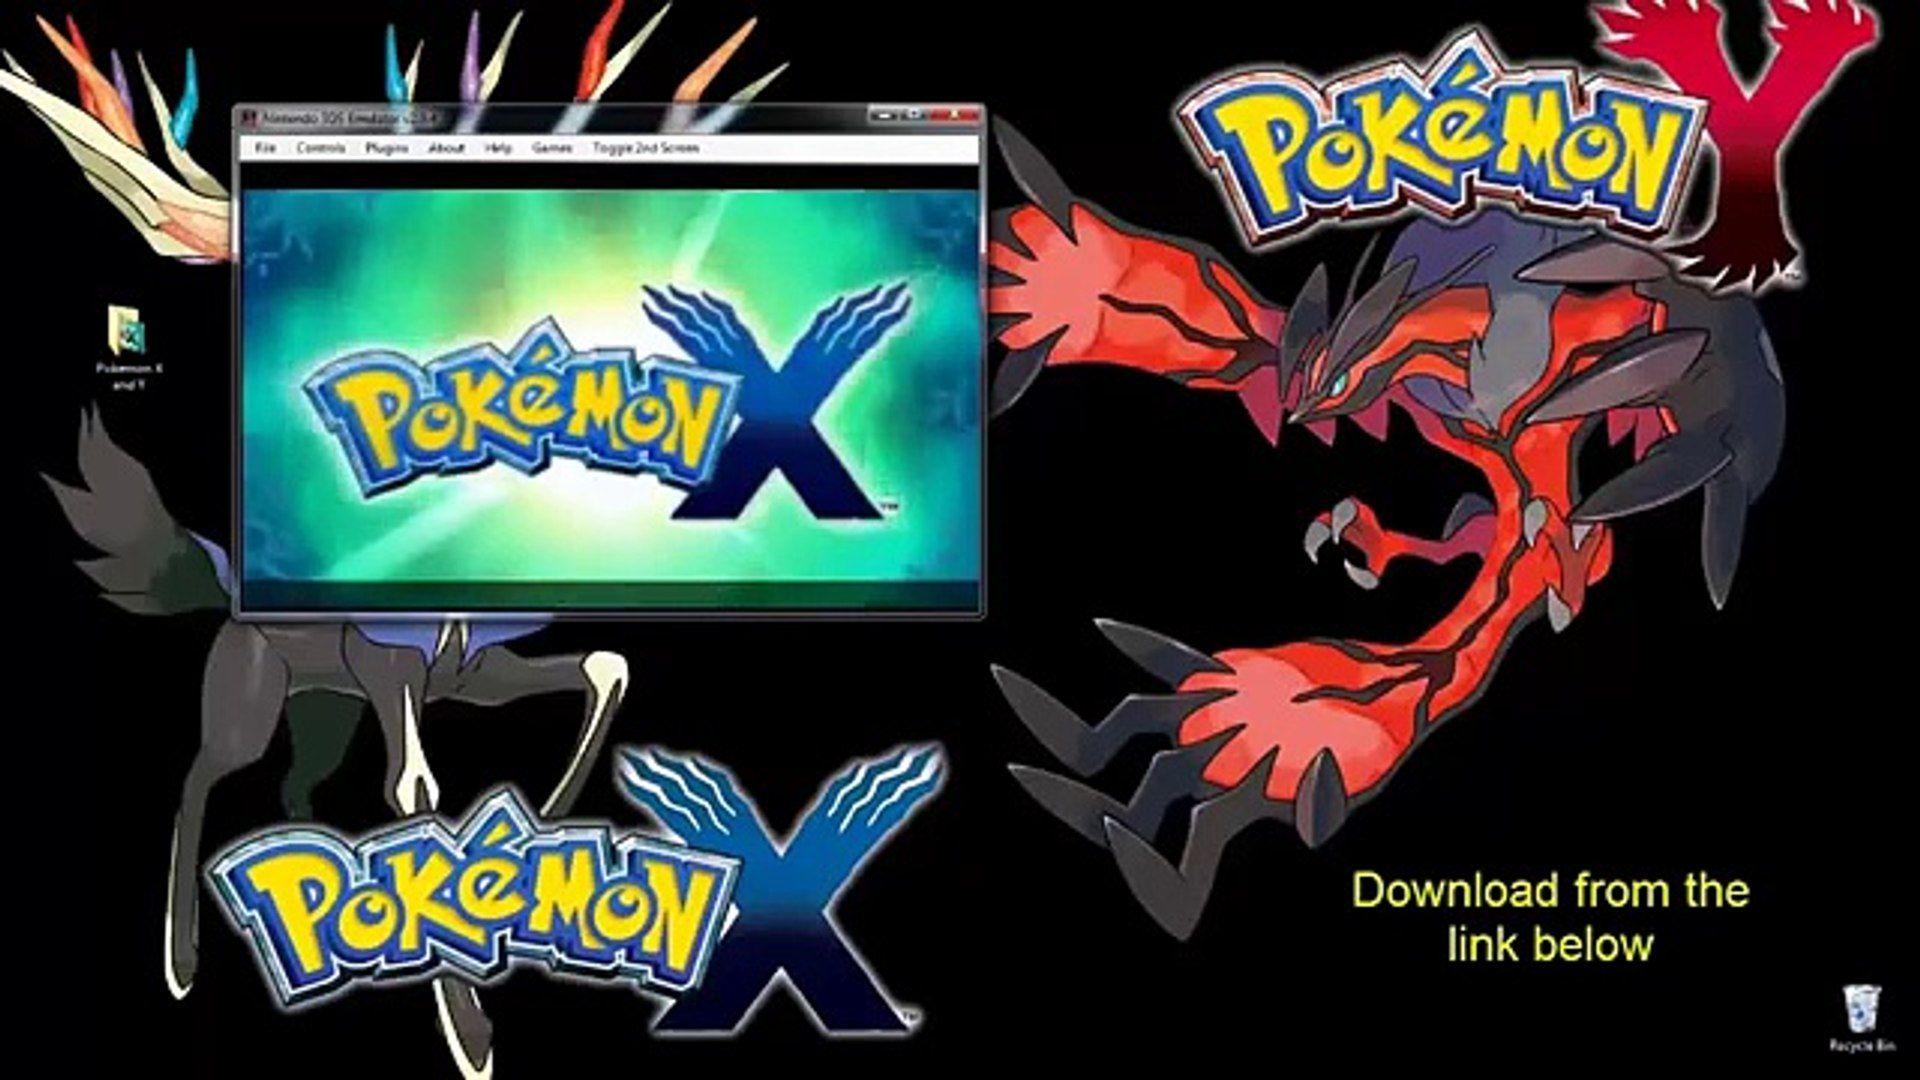 Pokemon x download code no survey